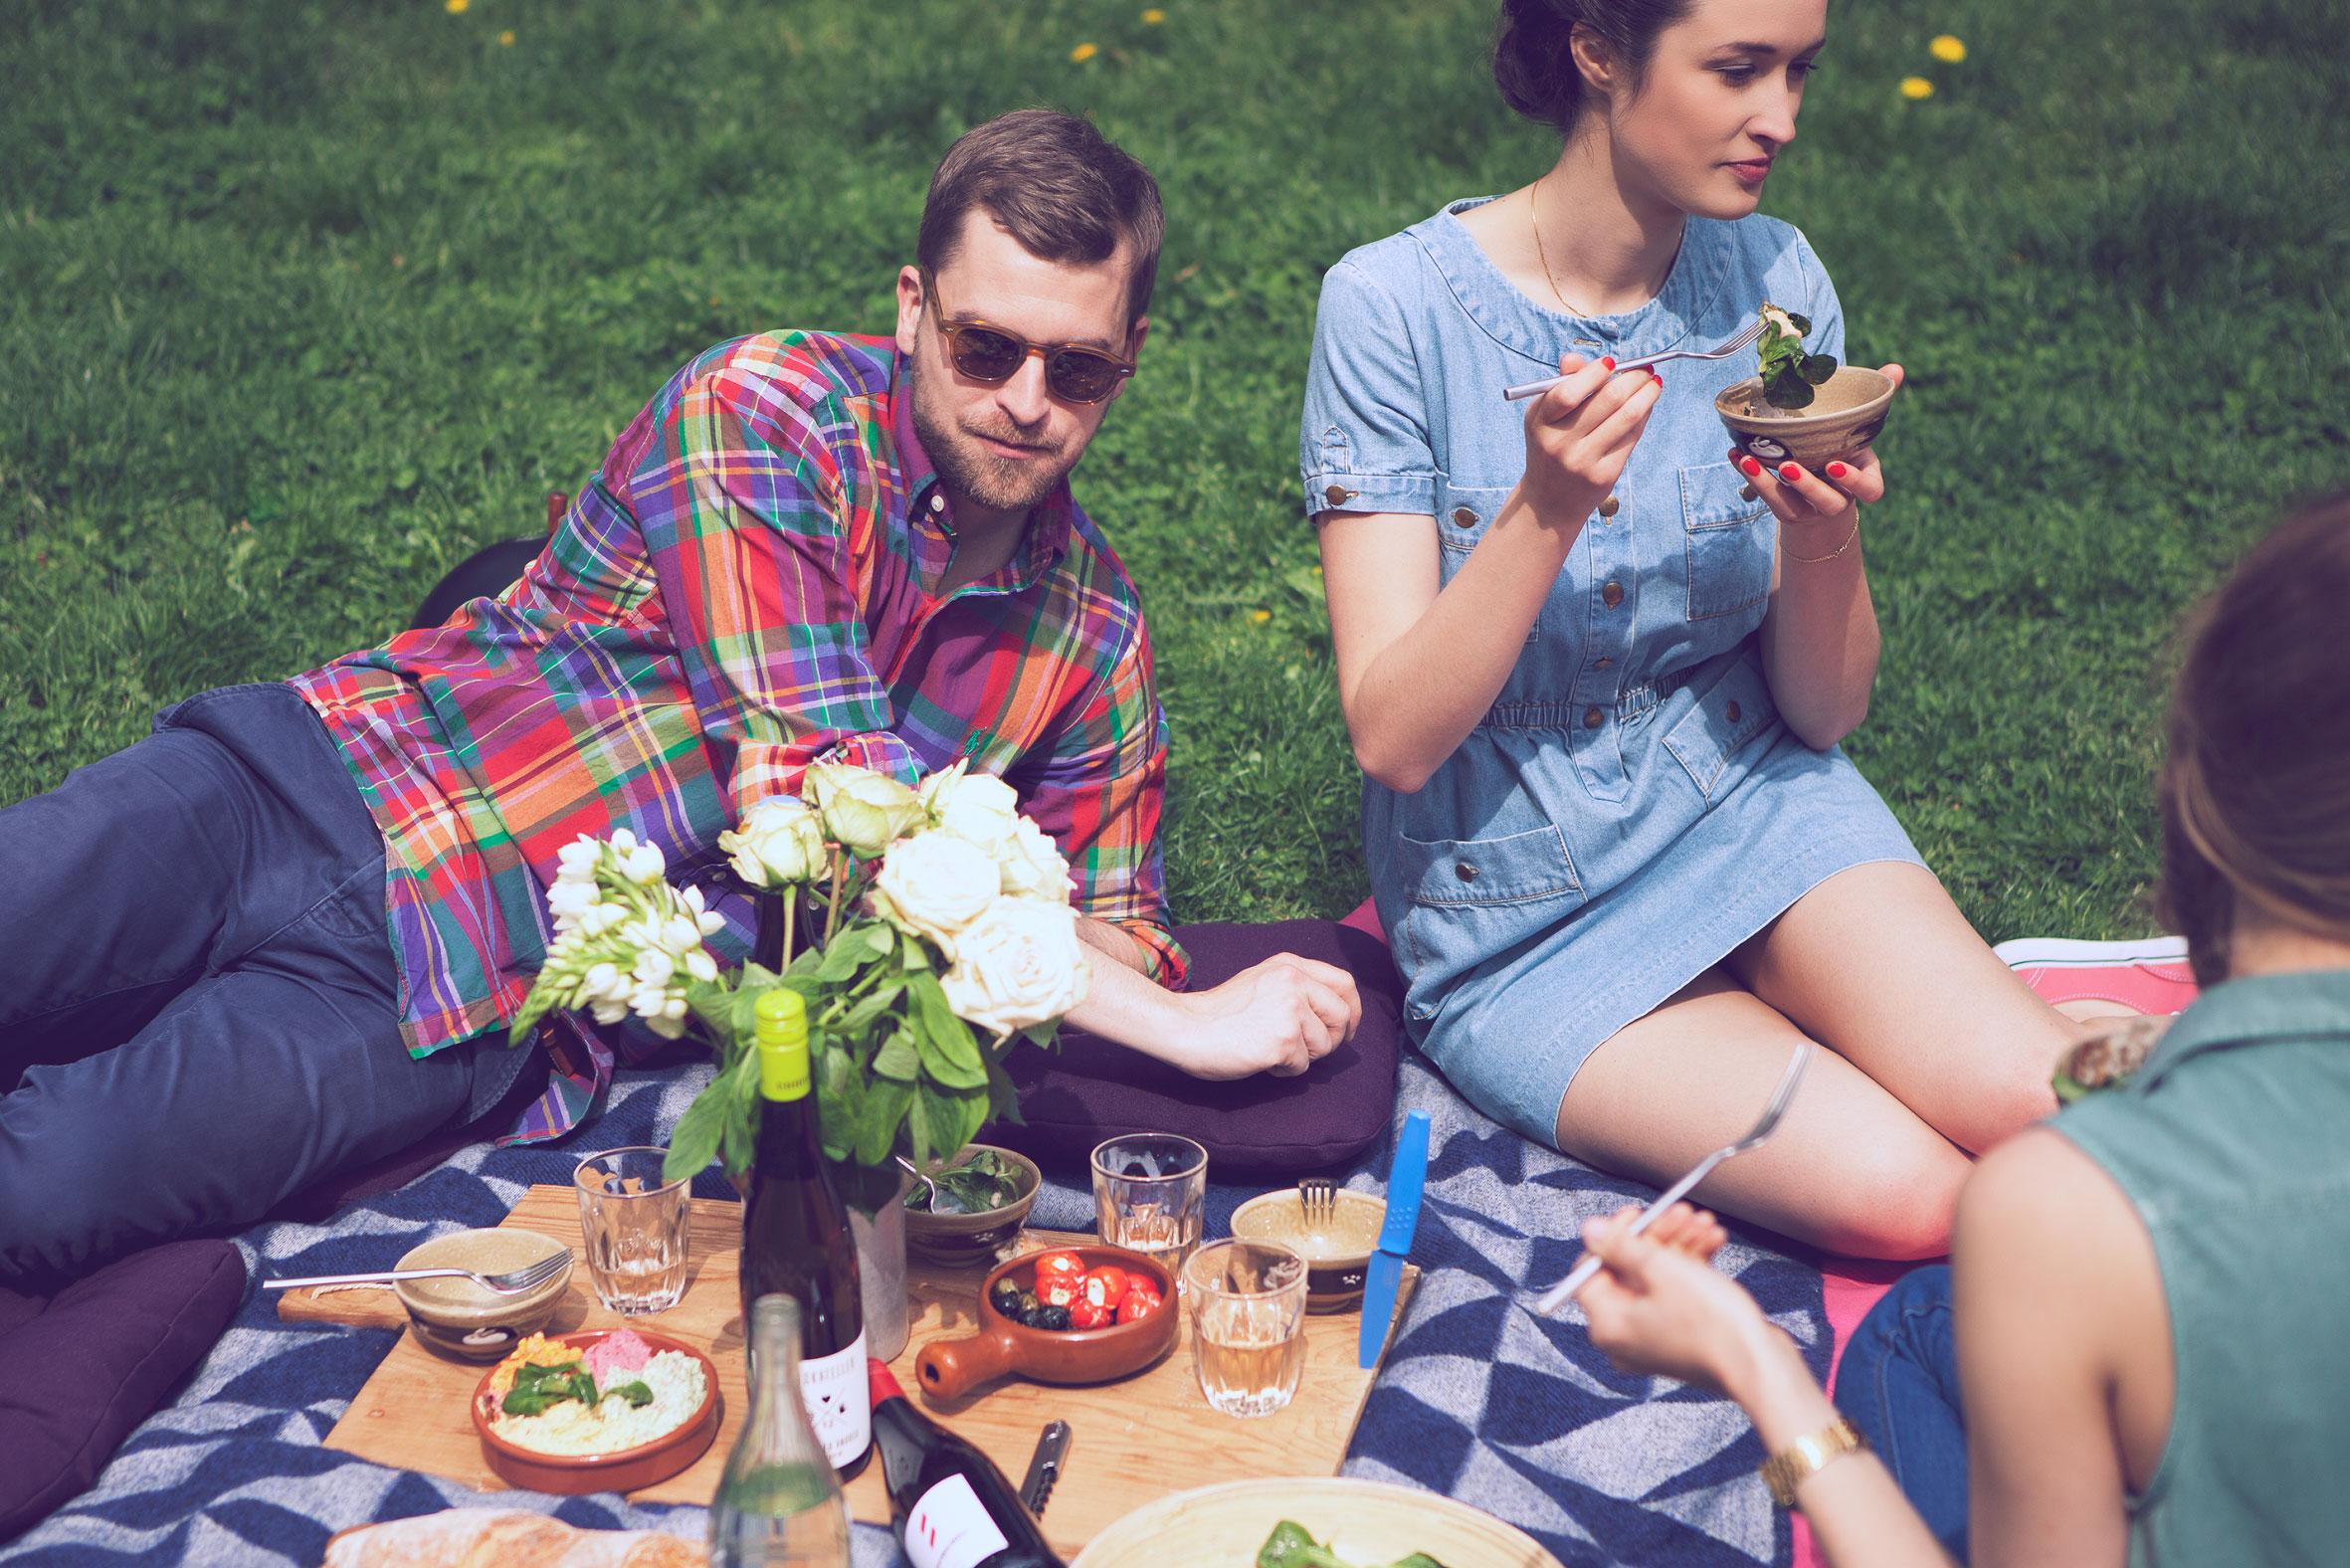 Geile-Weine-Moment-Picknick_web